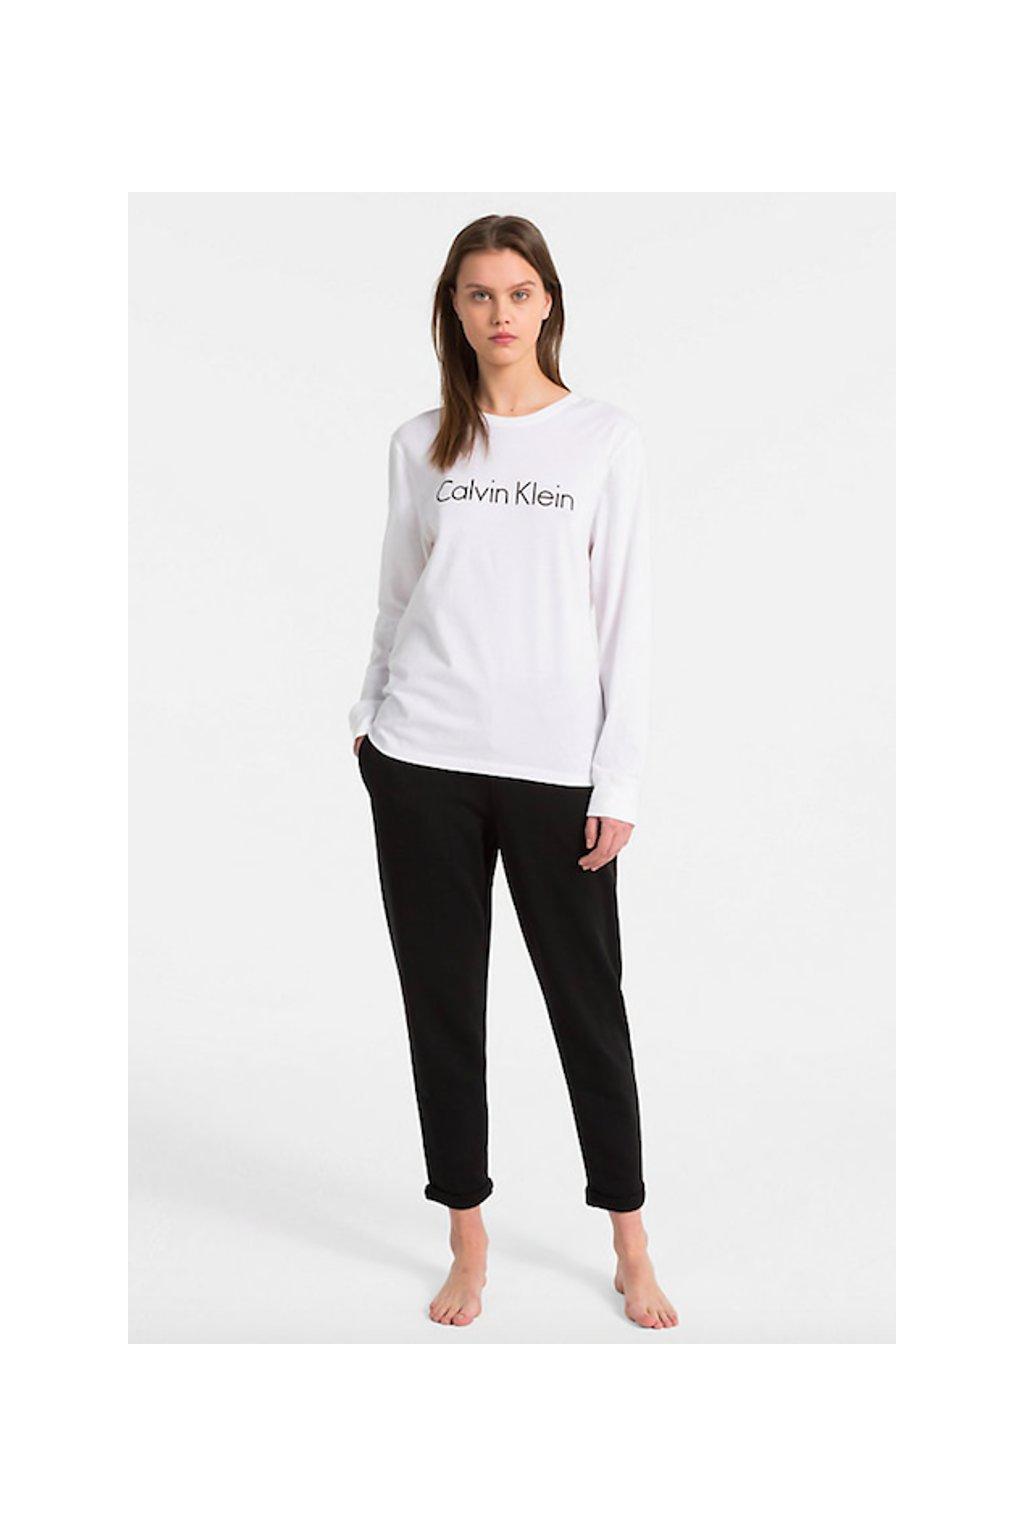 Calvin Klein Logo tričko s dlouhým rukávem - bílé